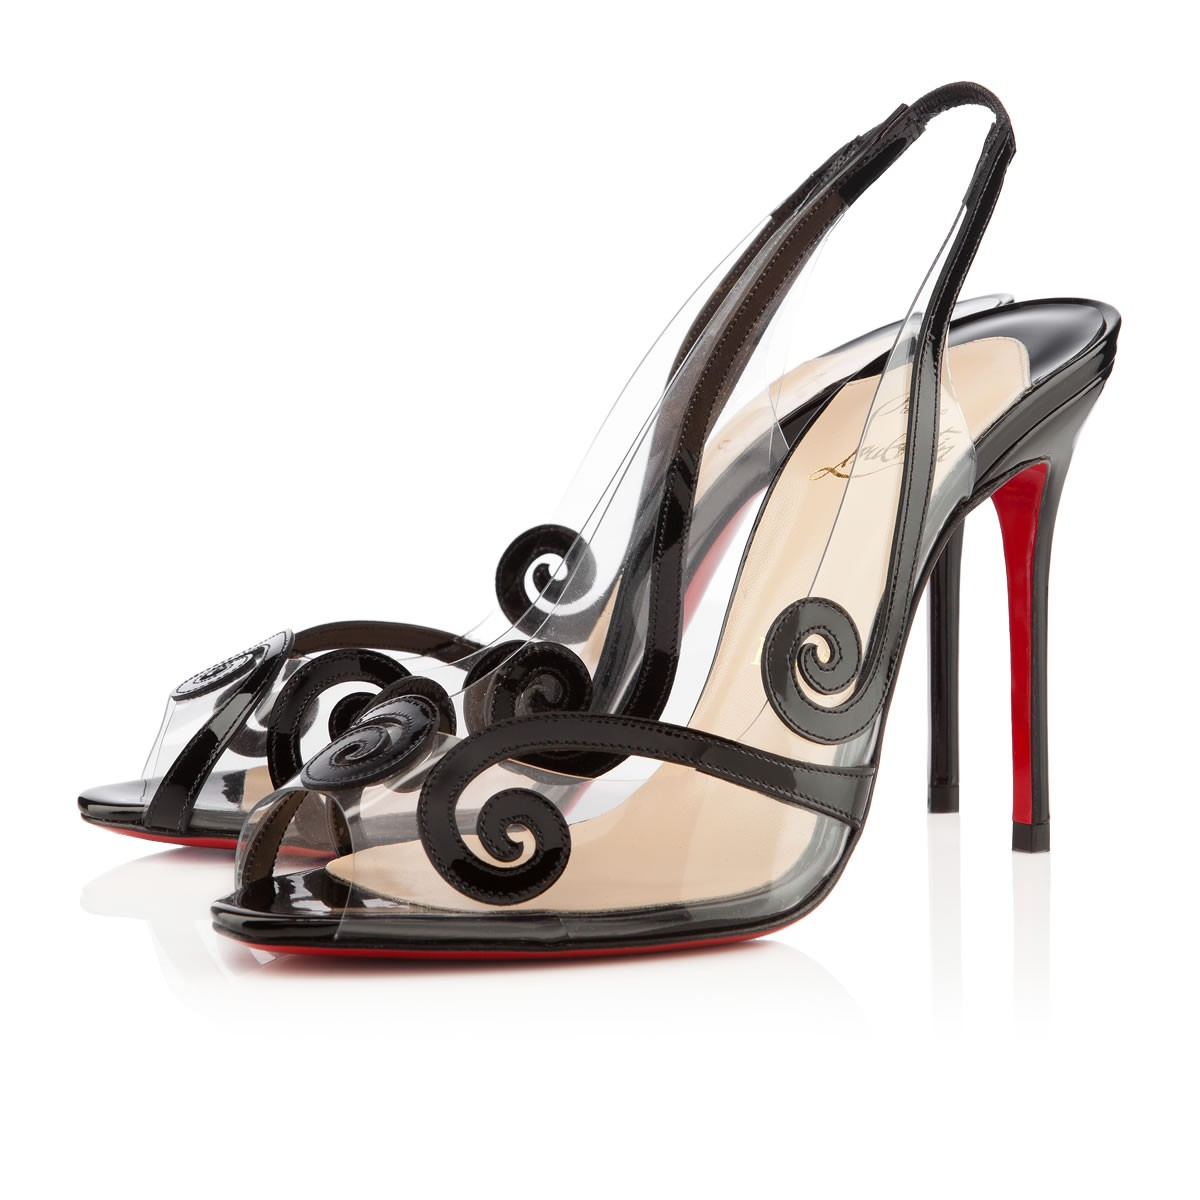 Artesur ? christian louboutin patent leather Au Hameau slingback pumps